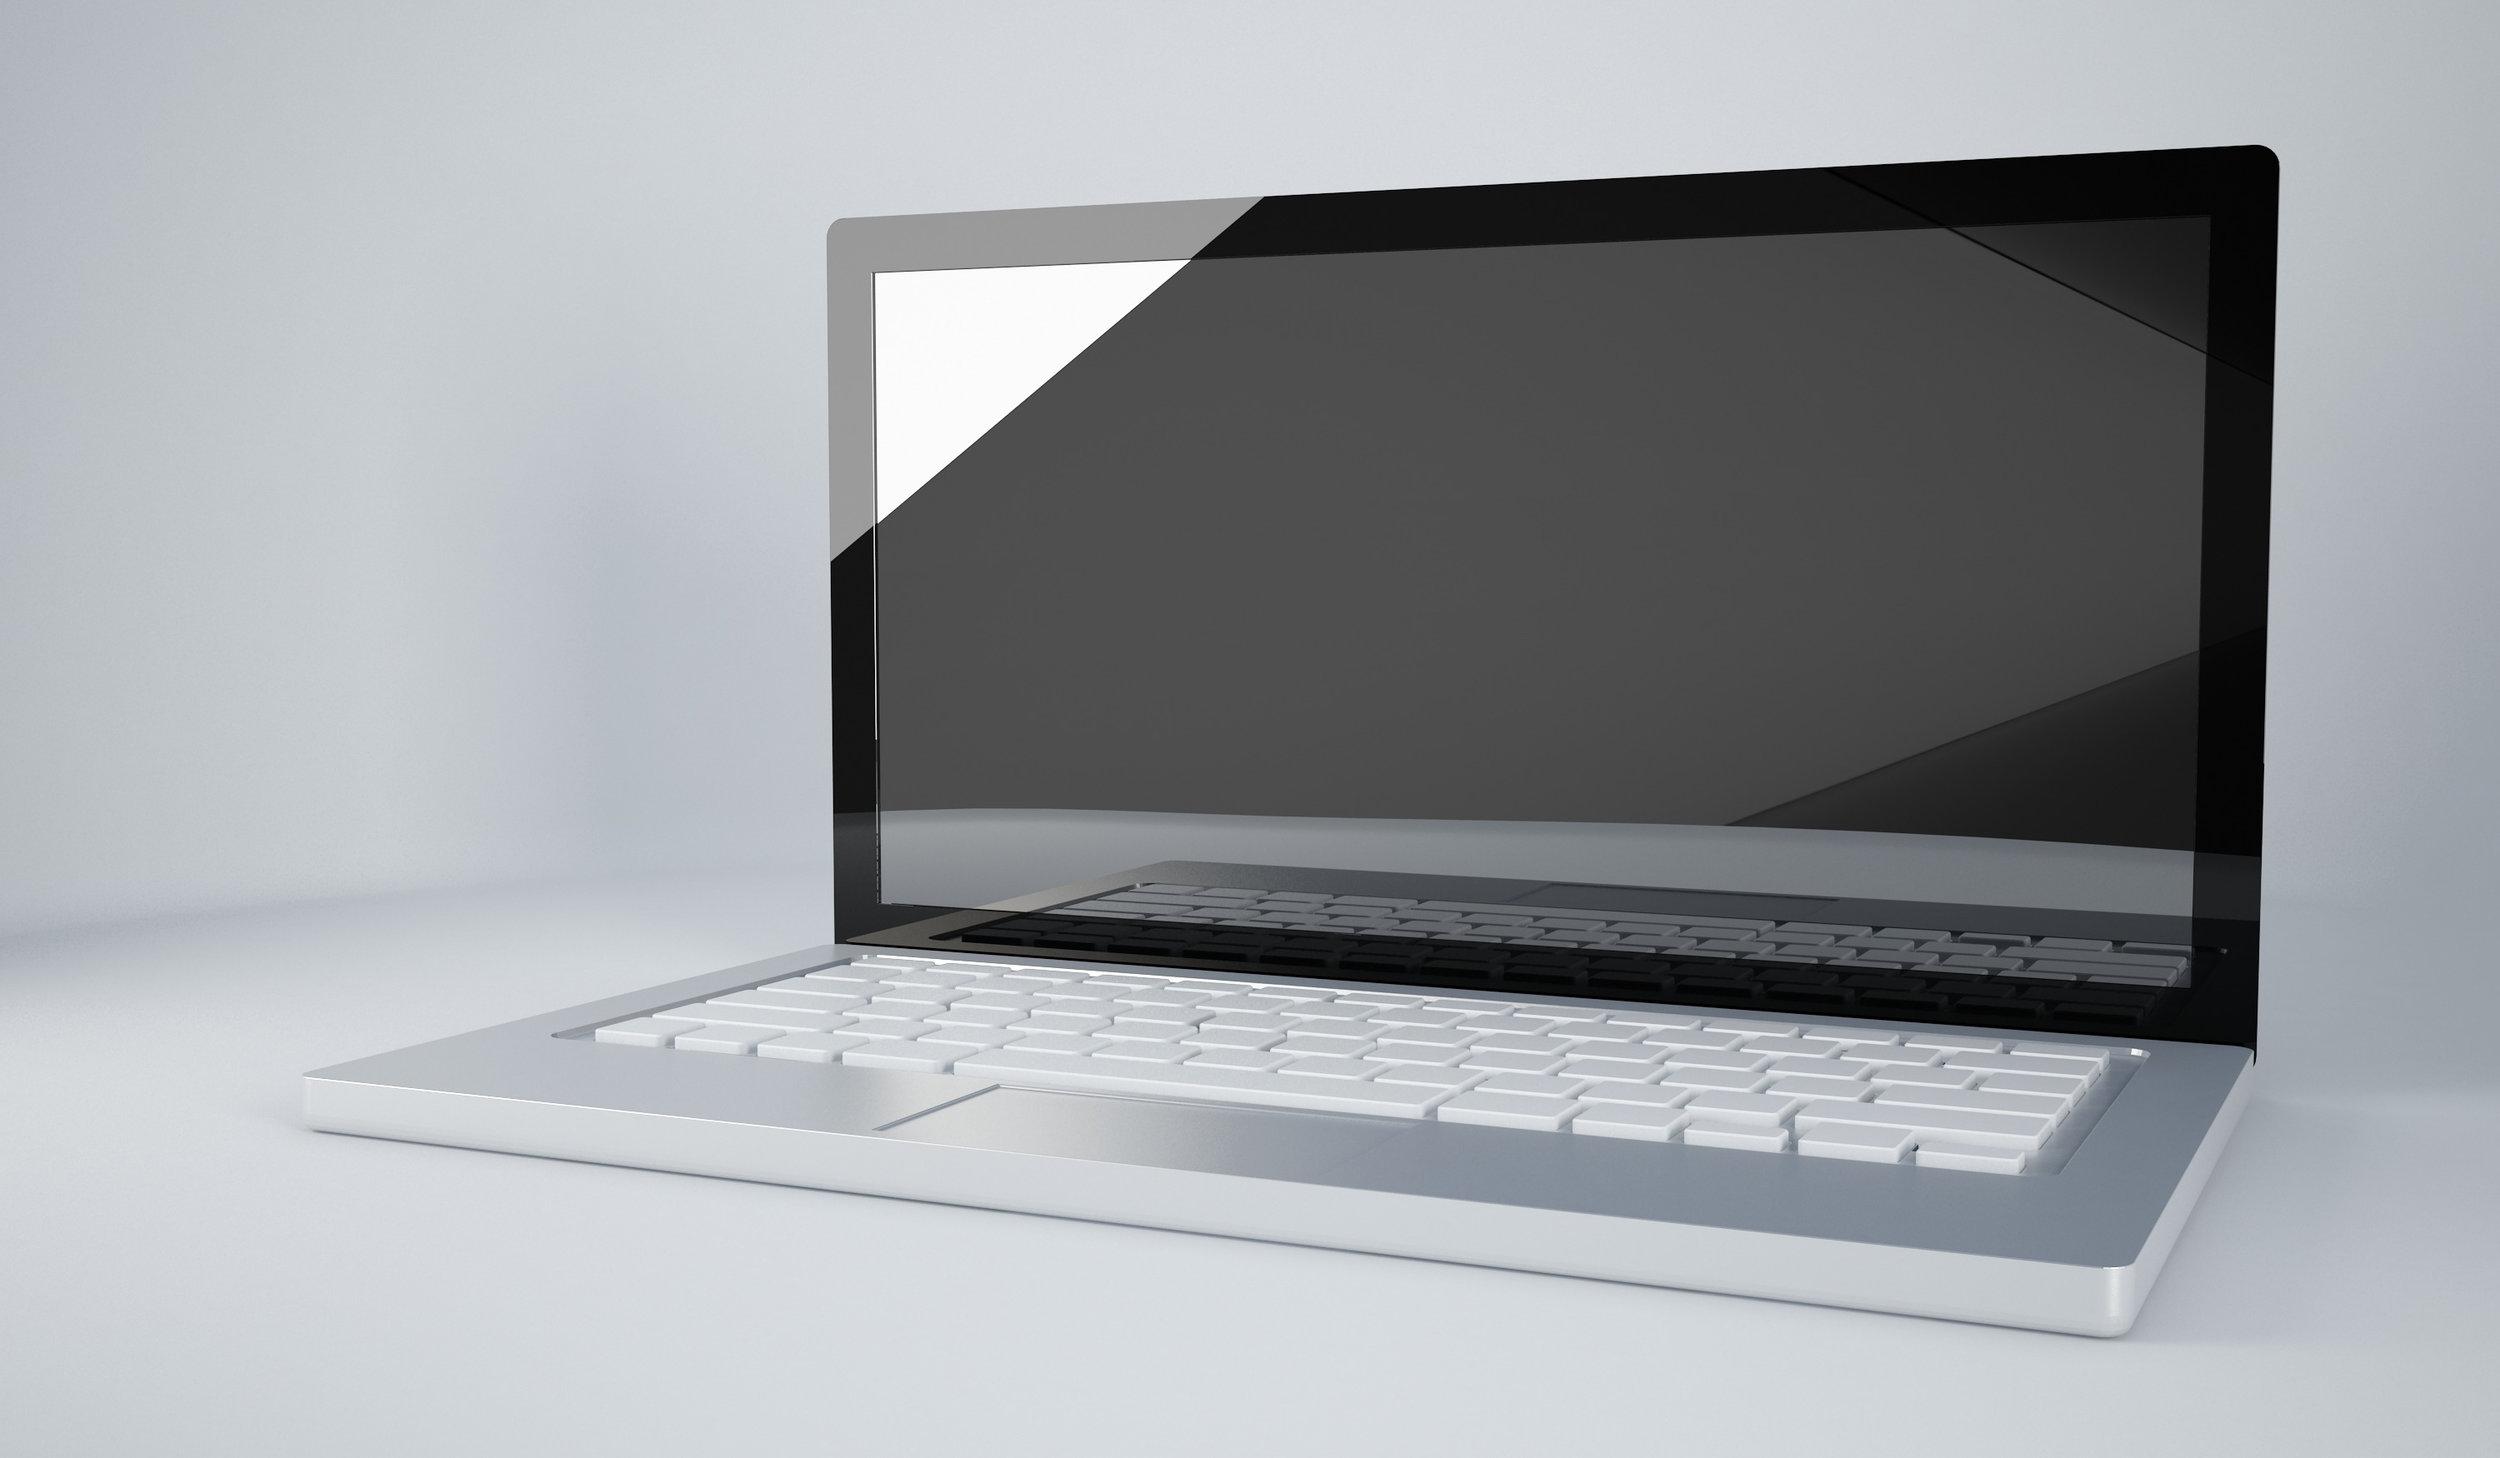 laptop_M1vFgtrO.jpg